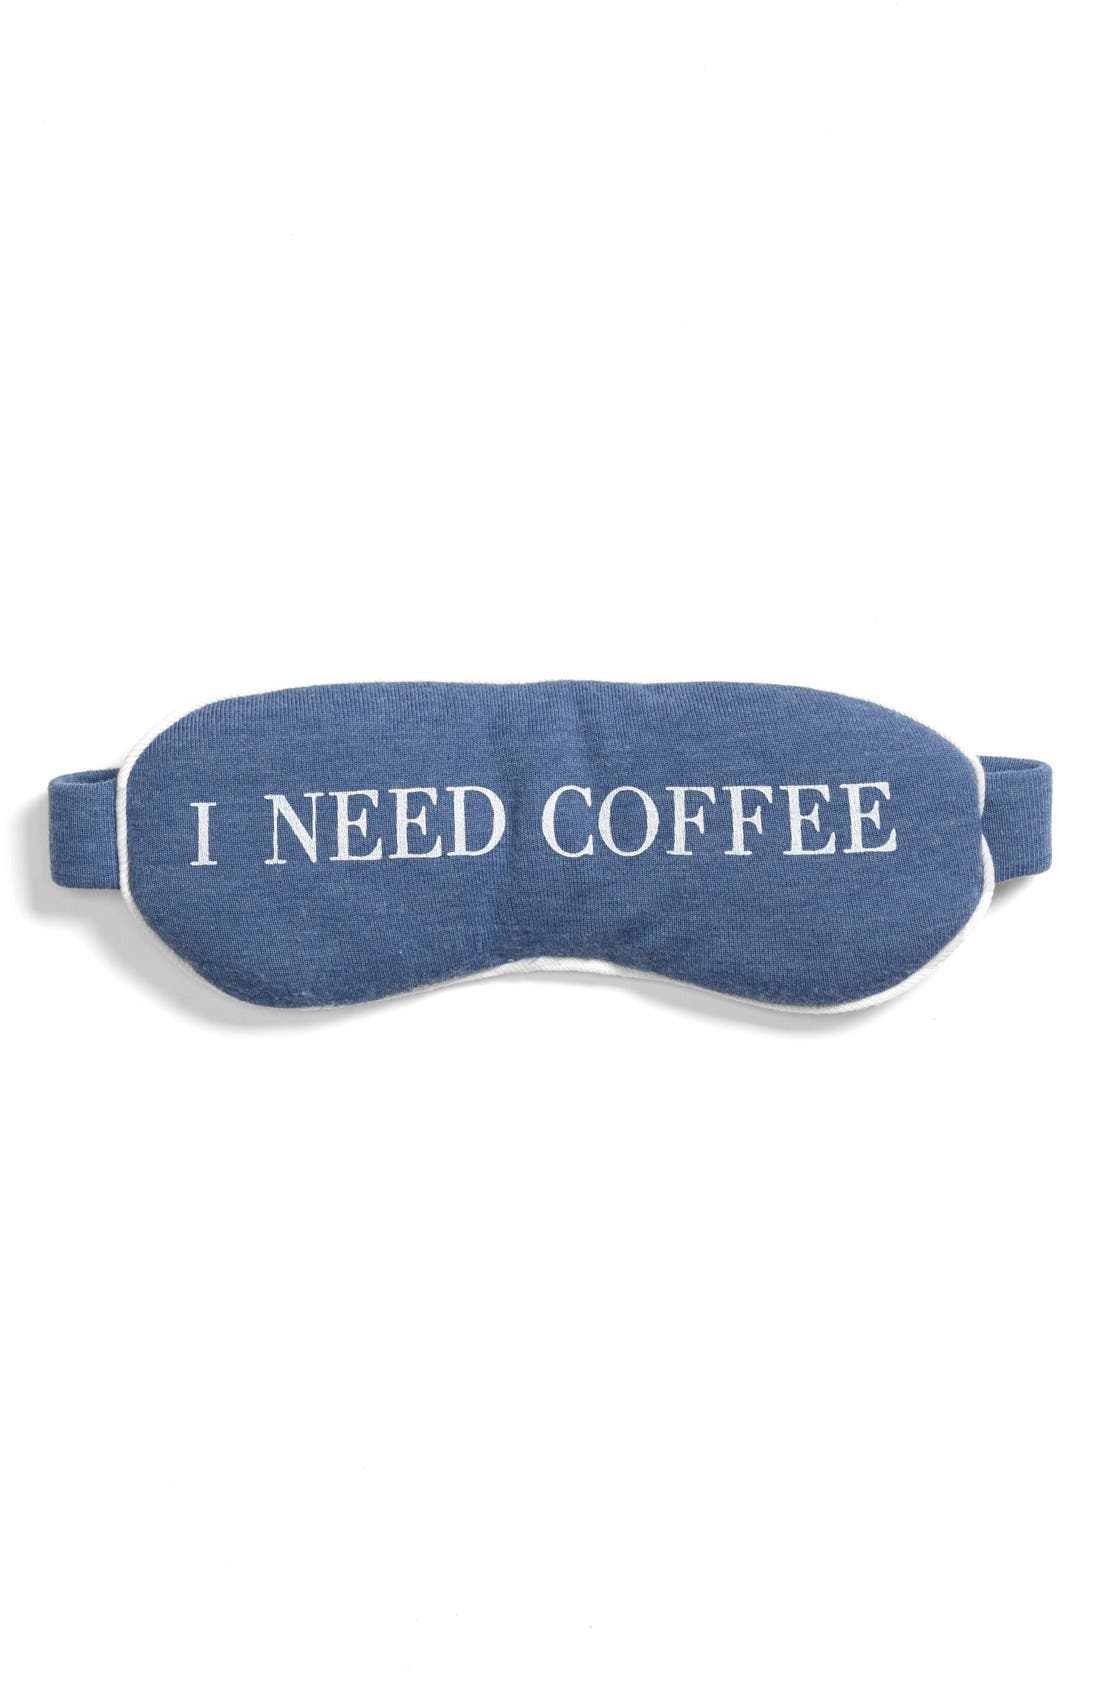 Main Image - Wildfox 'I Need Coffee' Sleep Mask